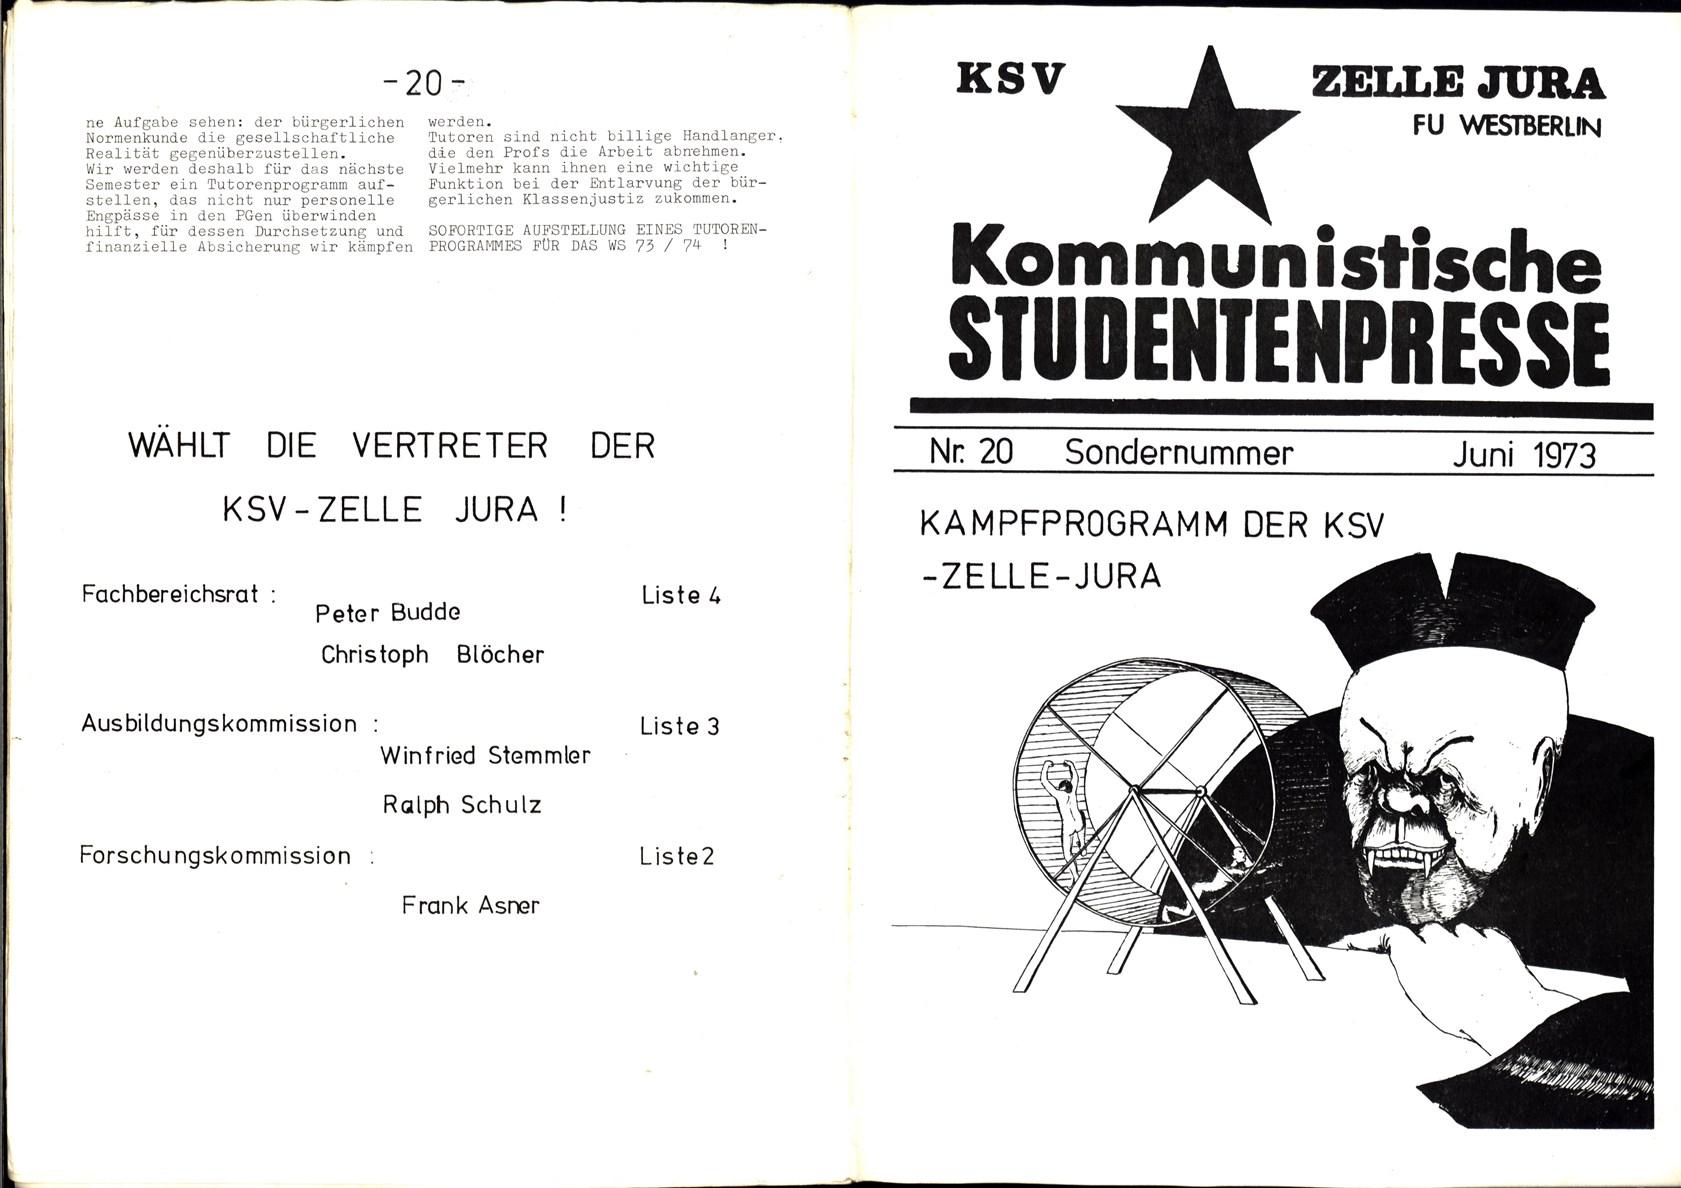 Berlin_KSV_Jura_Studentenpresse_19730600_20_01